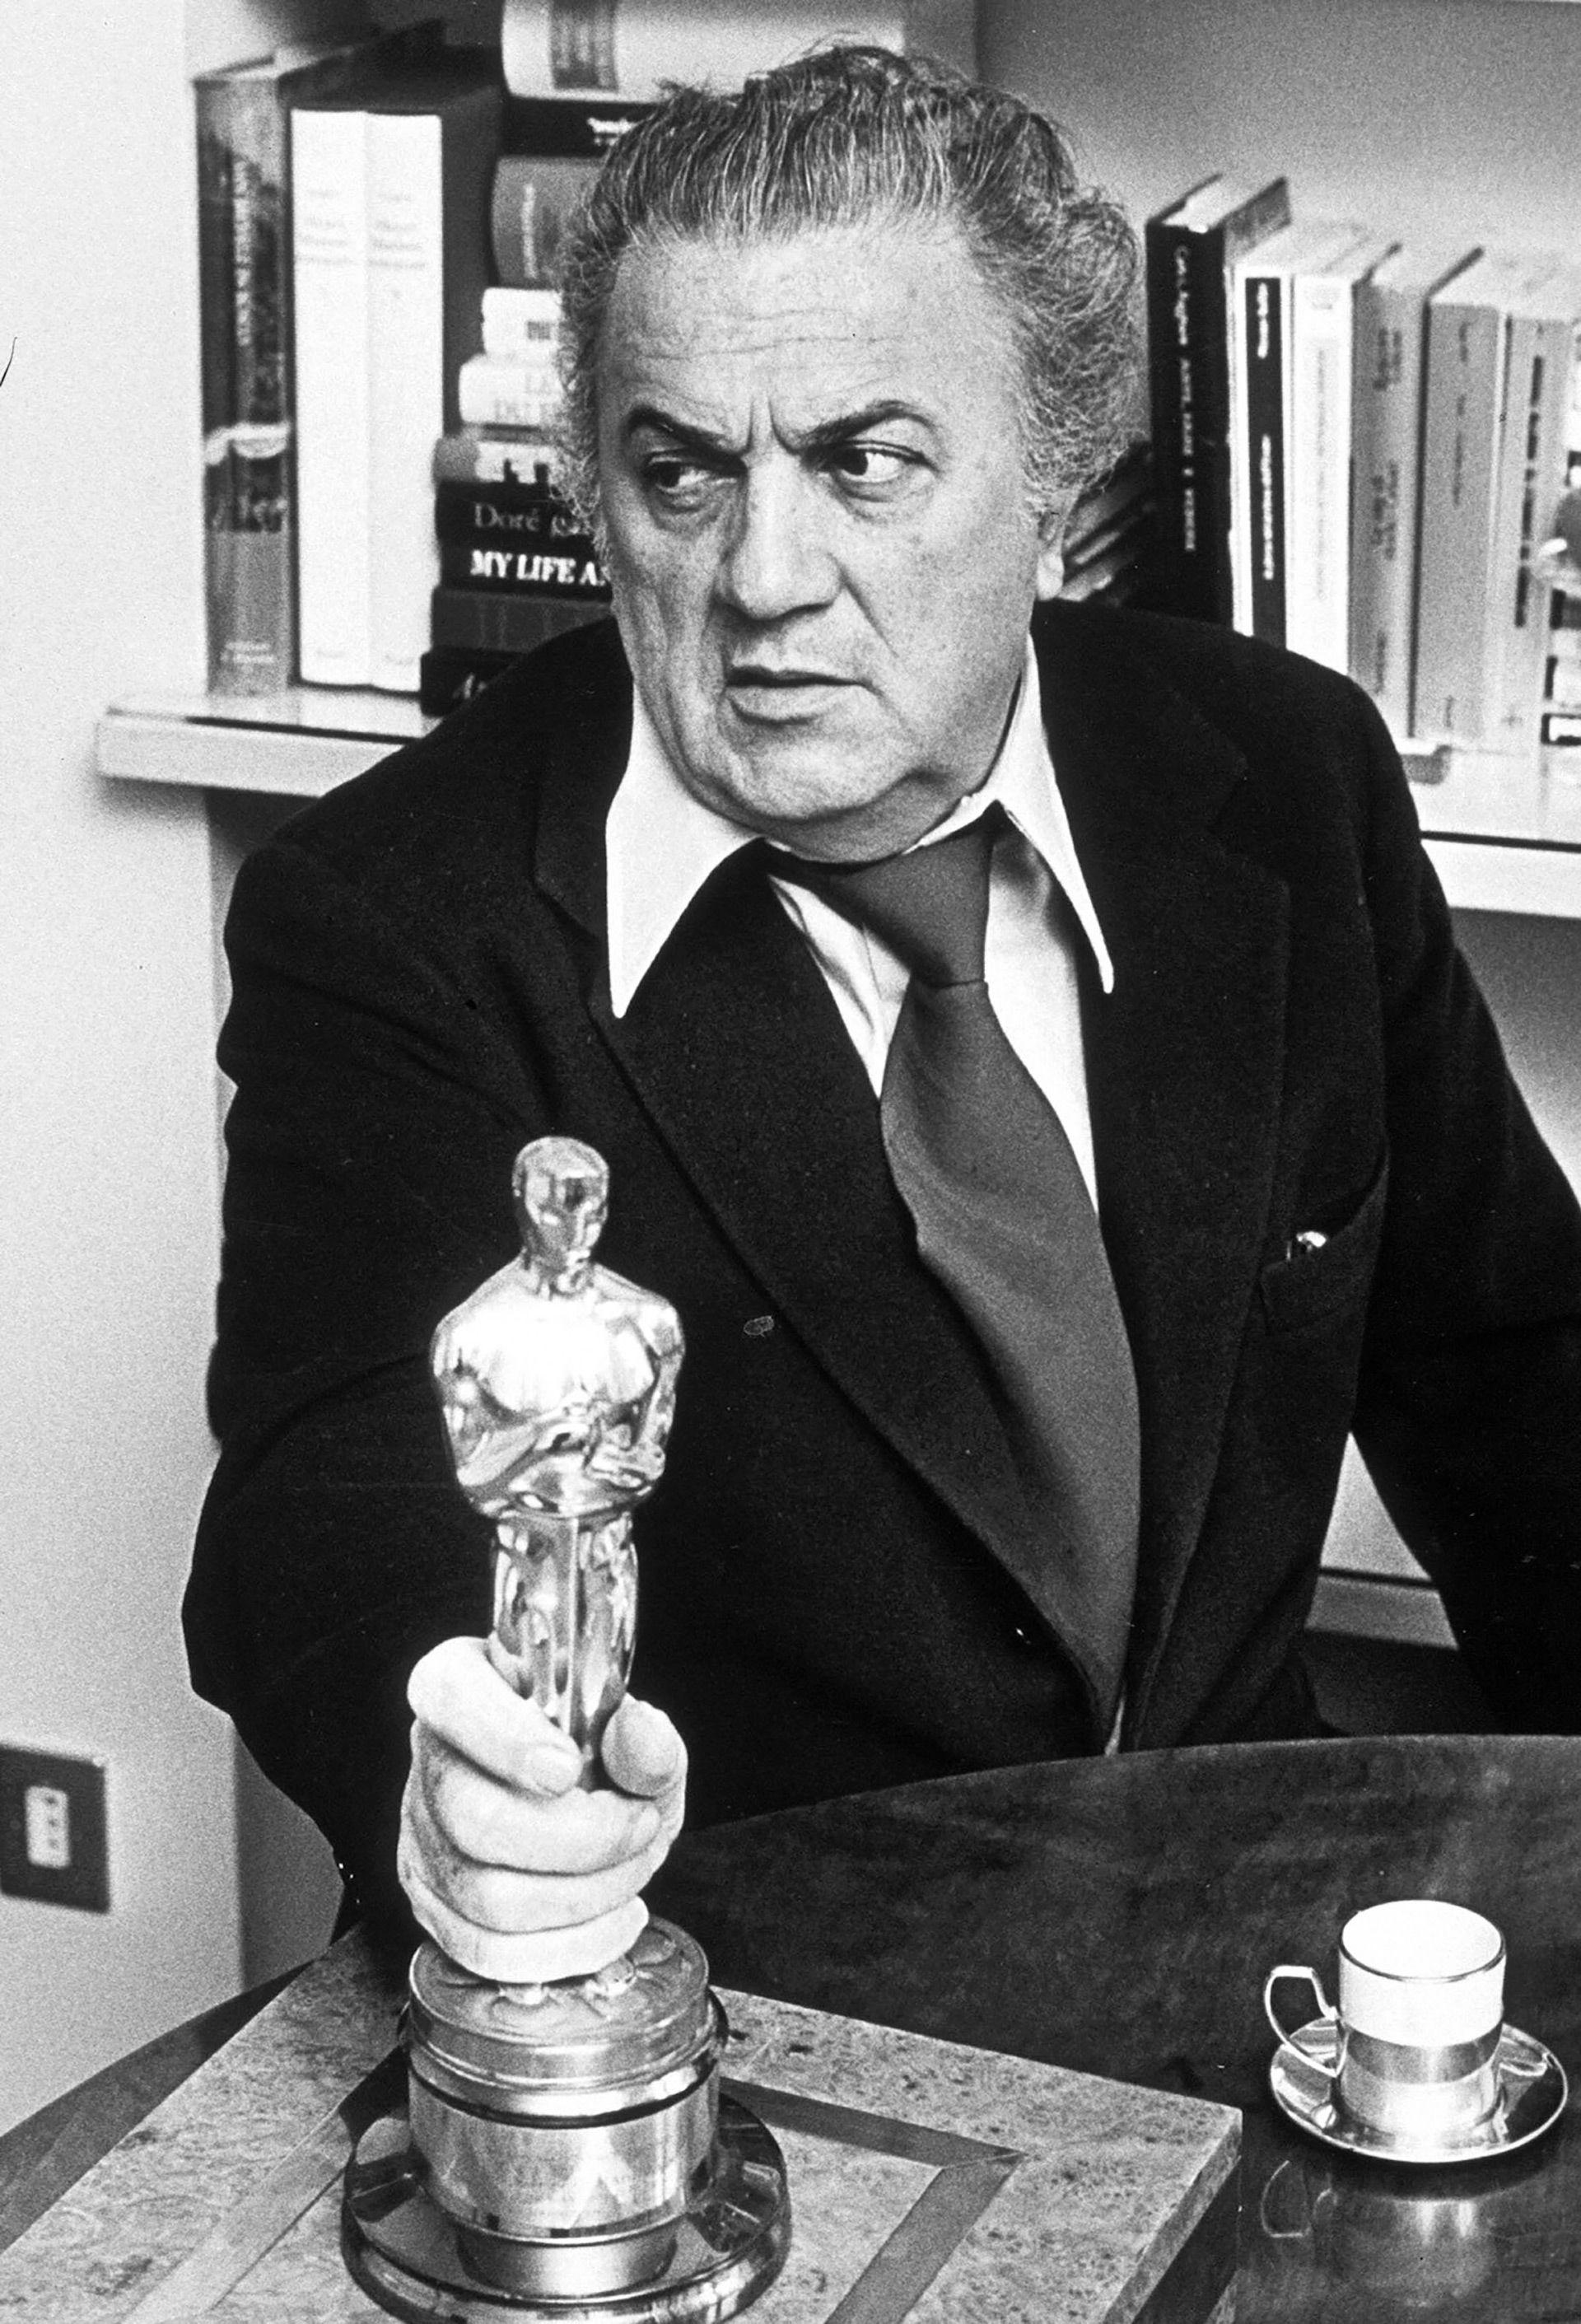 Fellini ya era entonces un reconocido cineasta a nivel internacional (Shutterstock)